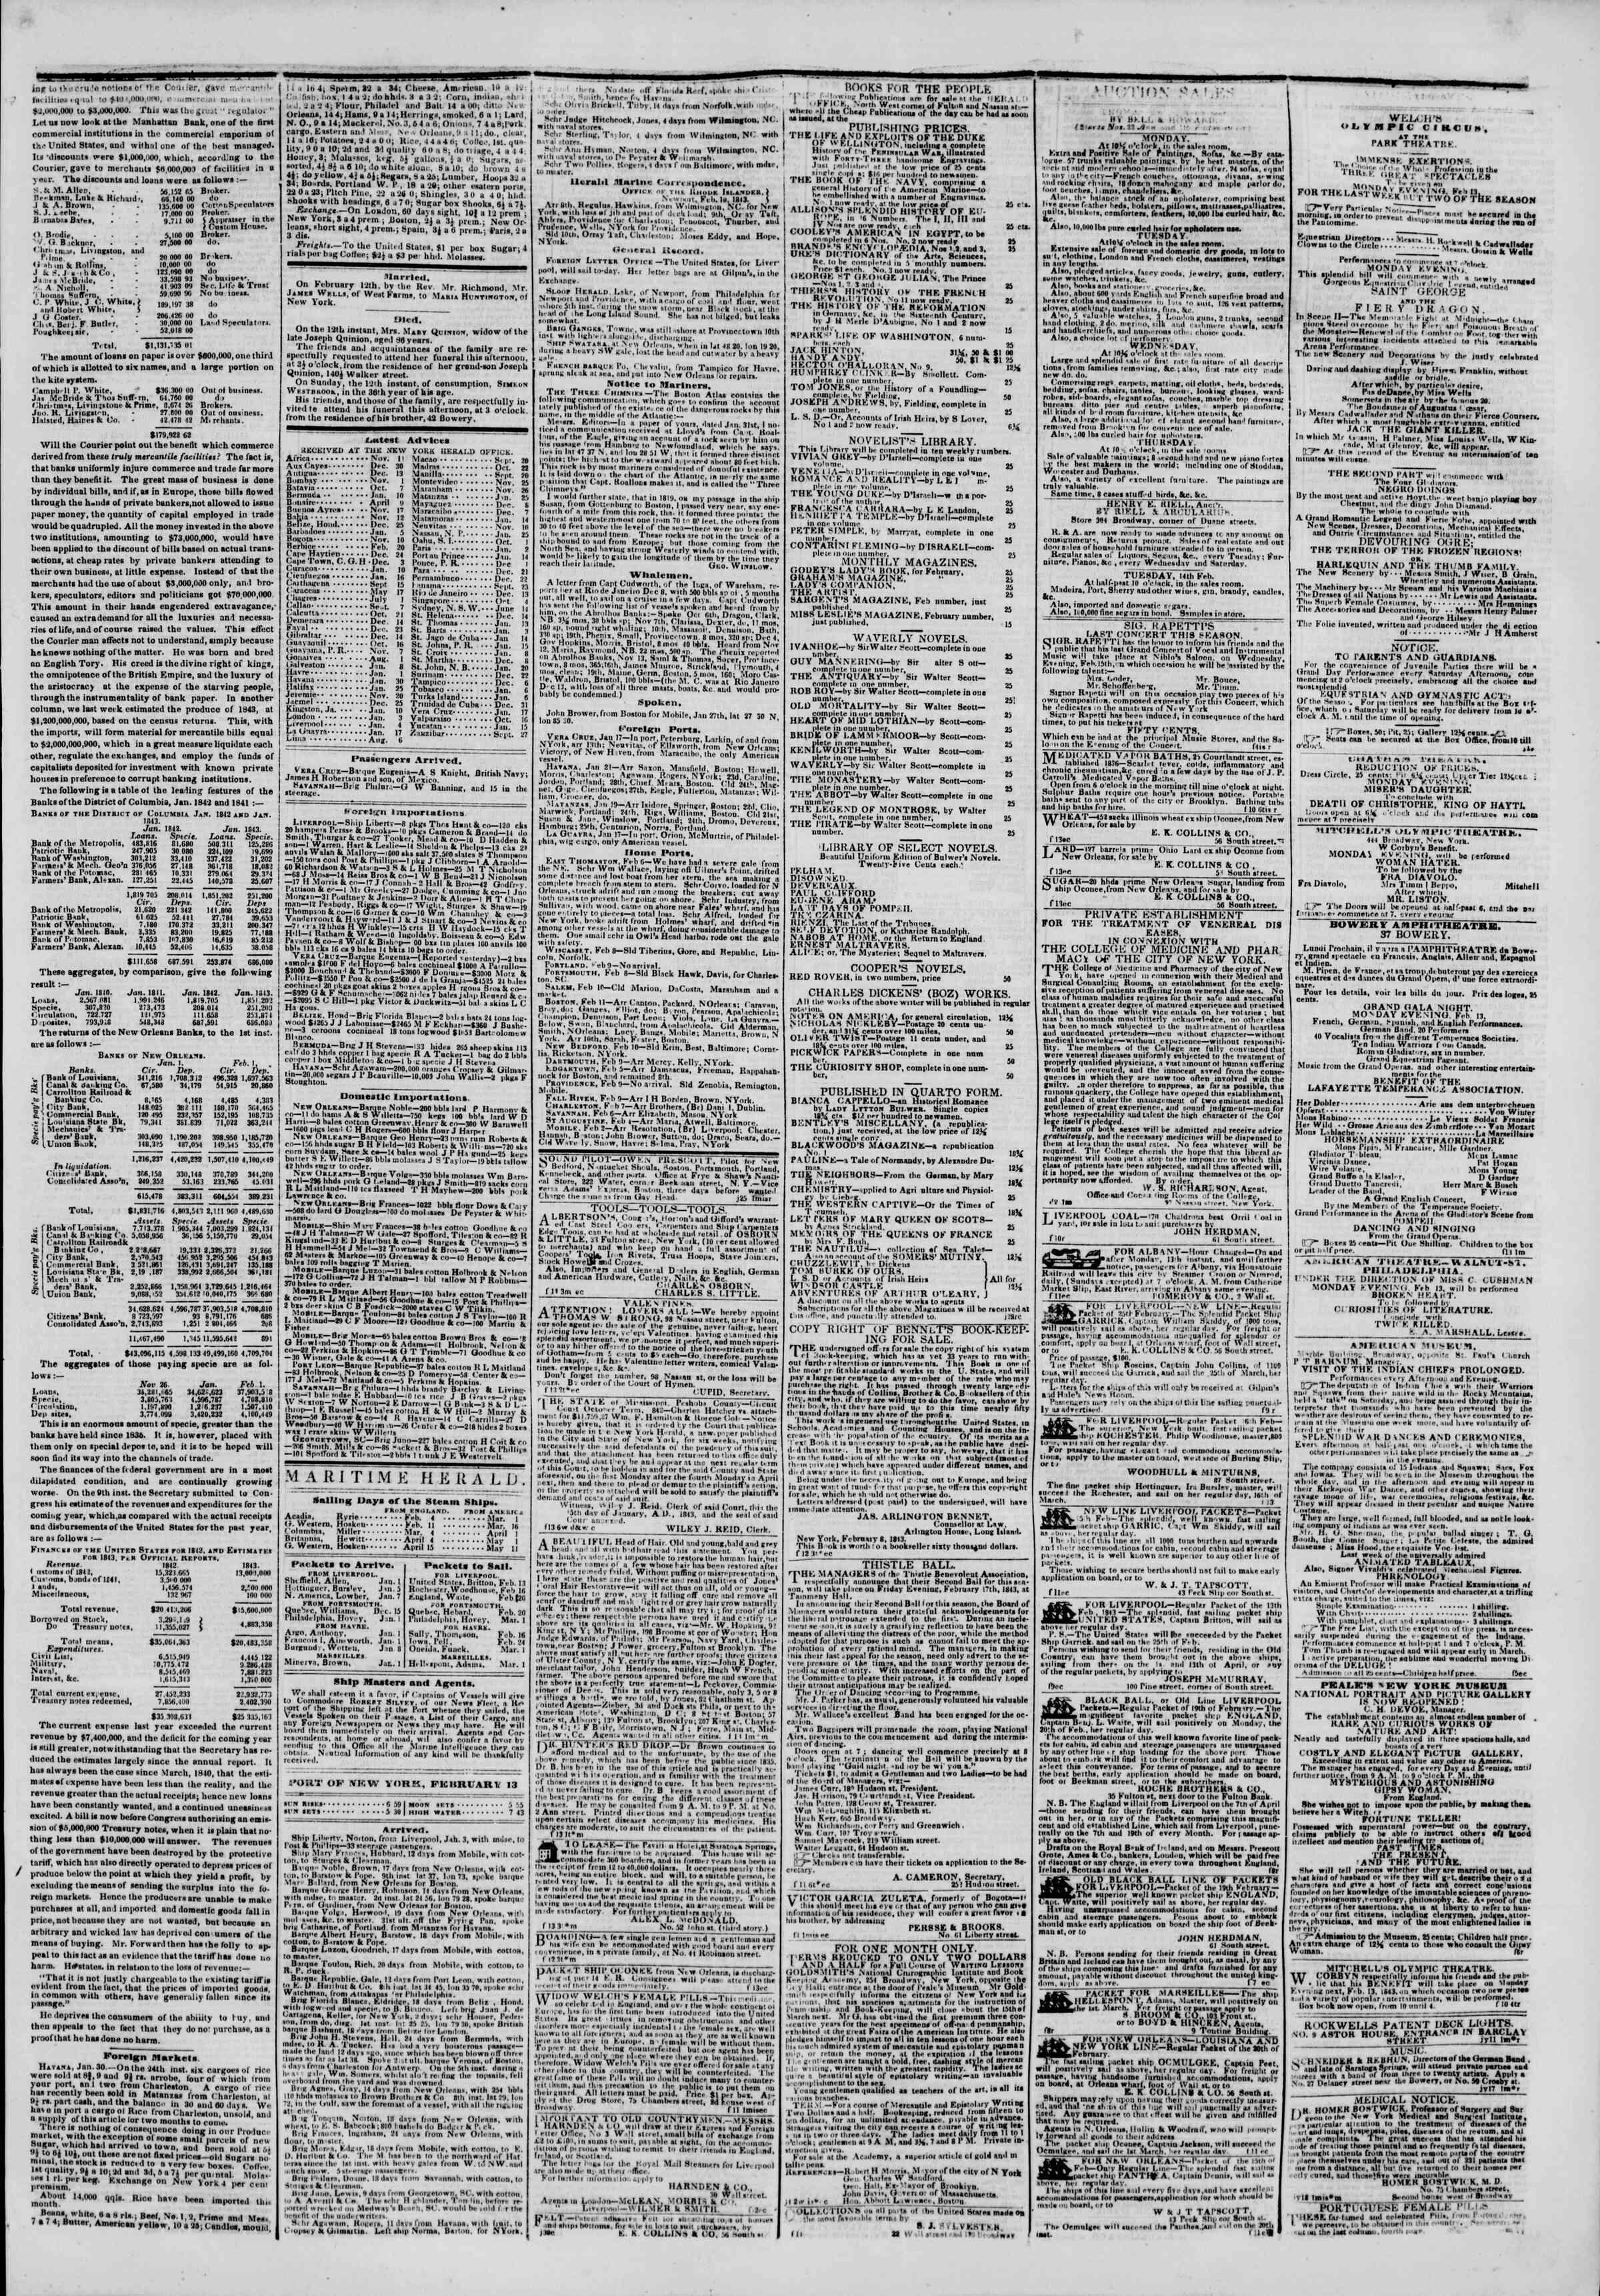 February 13, 1843 Tarihli The New York Herald Gazetesi Sayfa 3